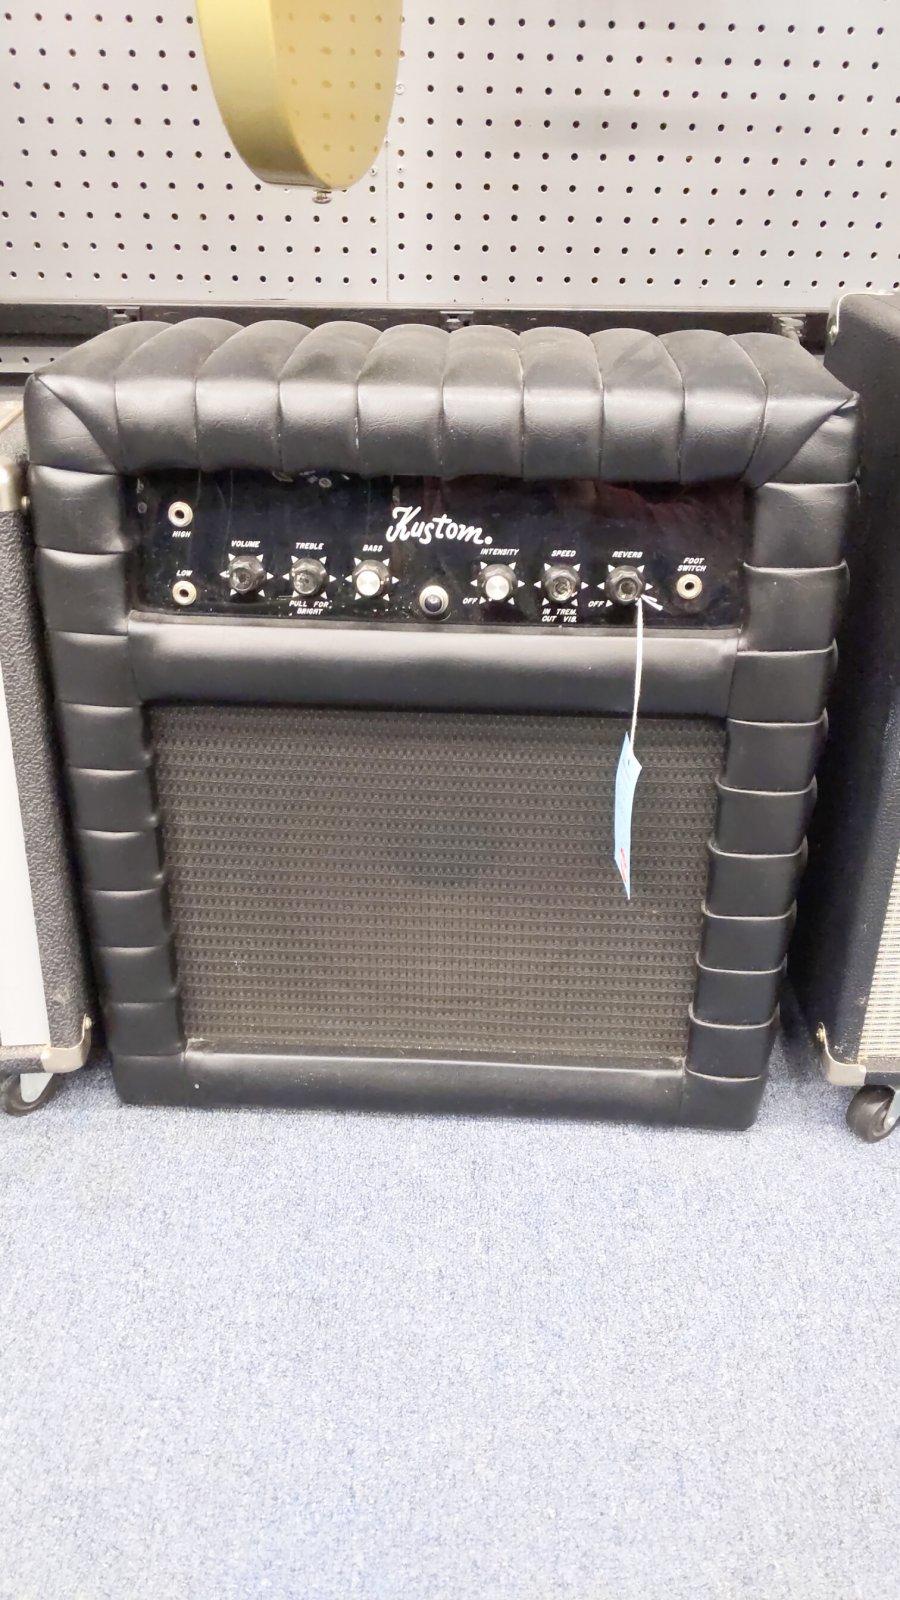 Kustom K25C amp with cover